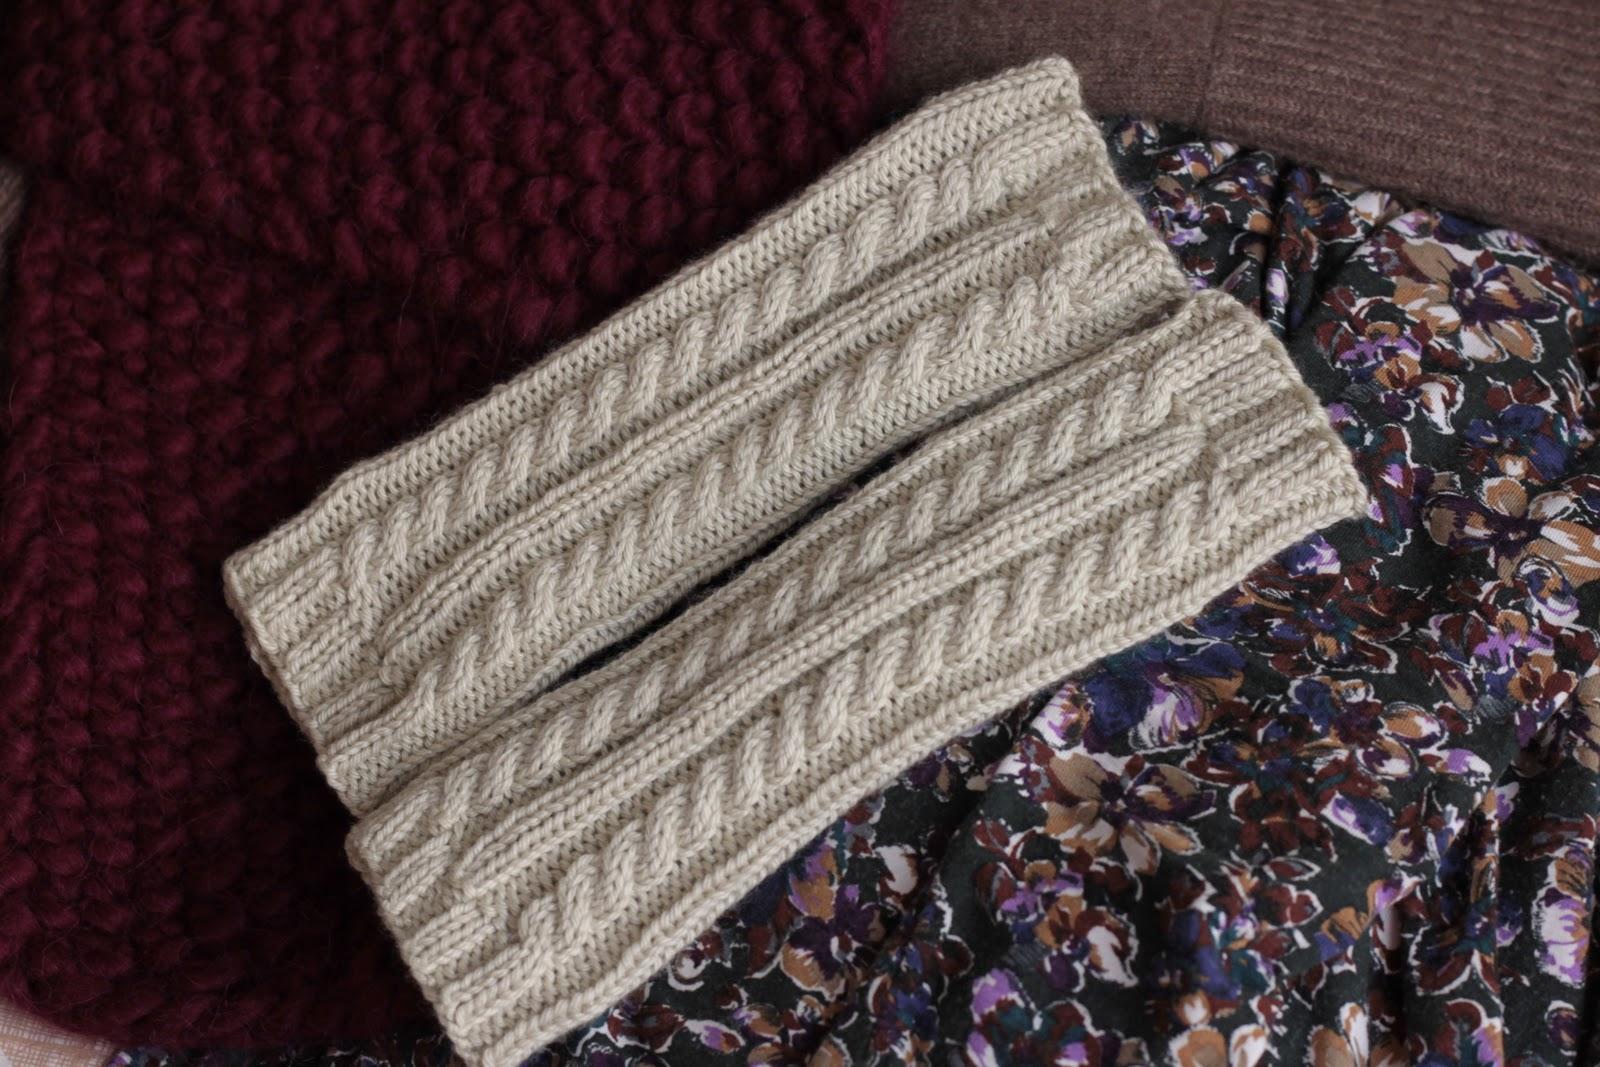 KnittingPony: Cabled Wrist Warmers (Free Knitting Pattern)